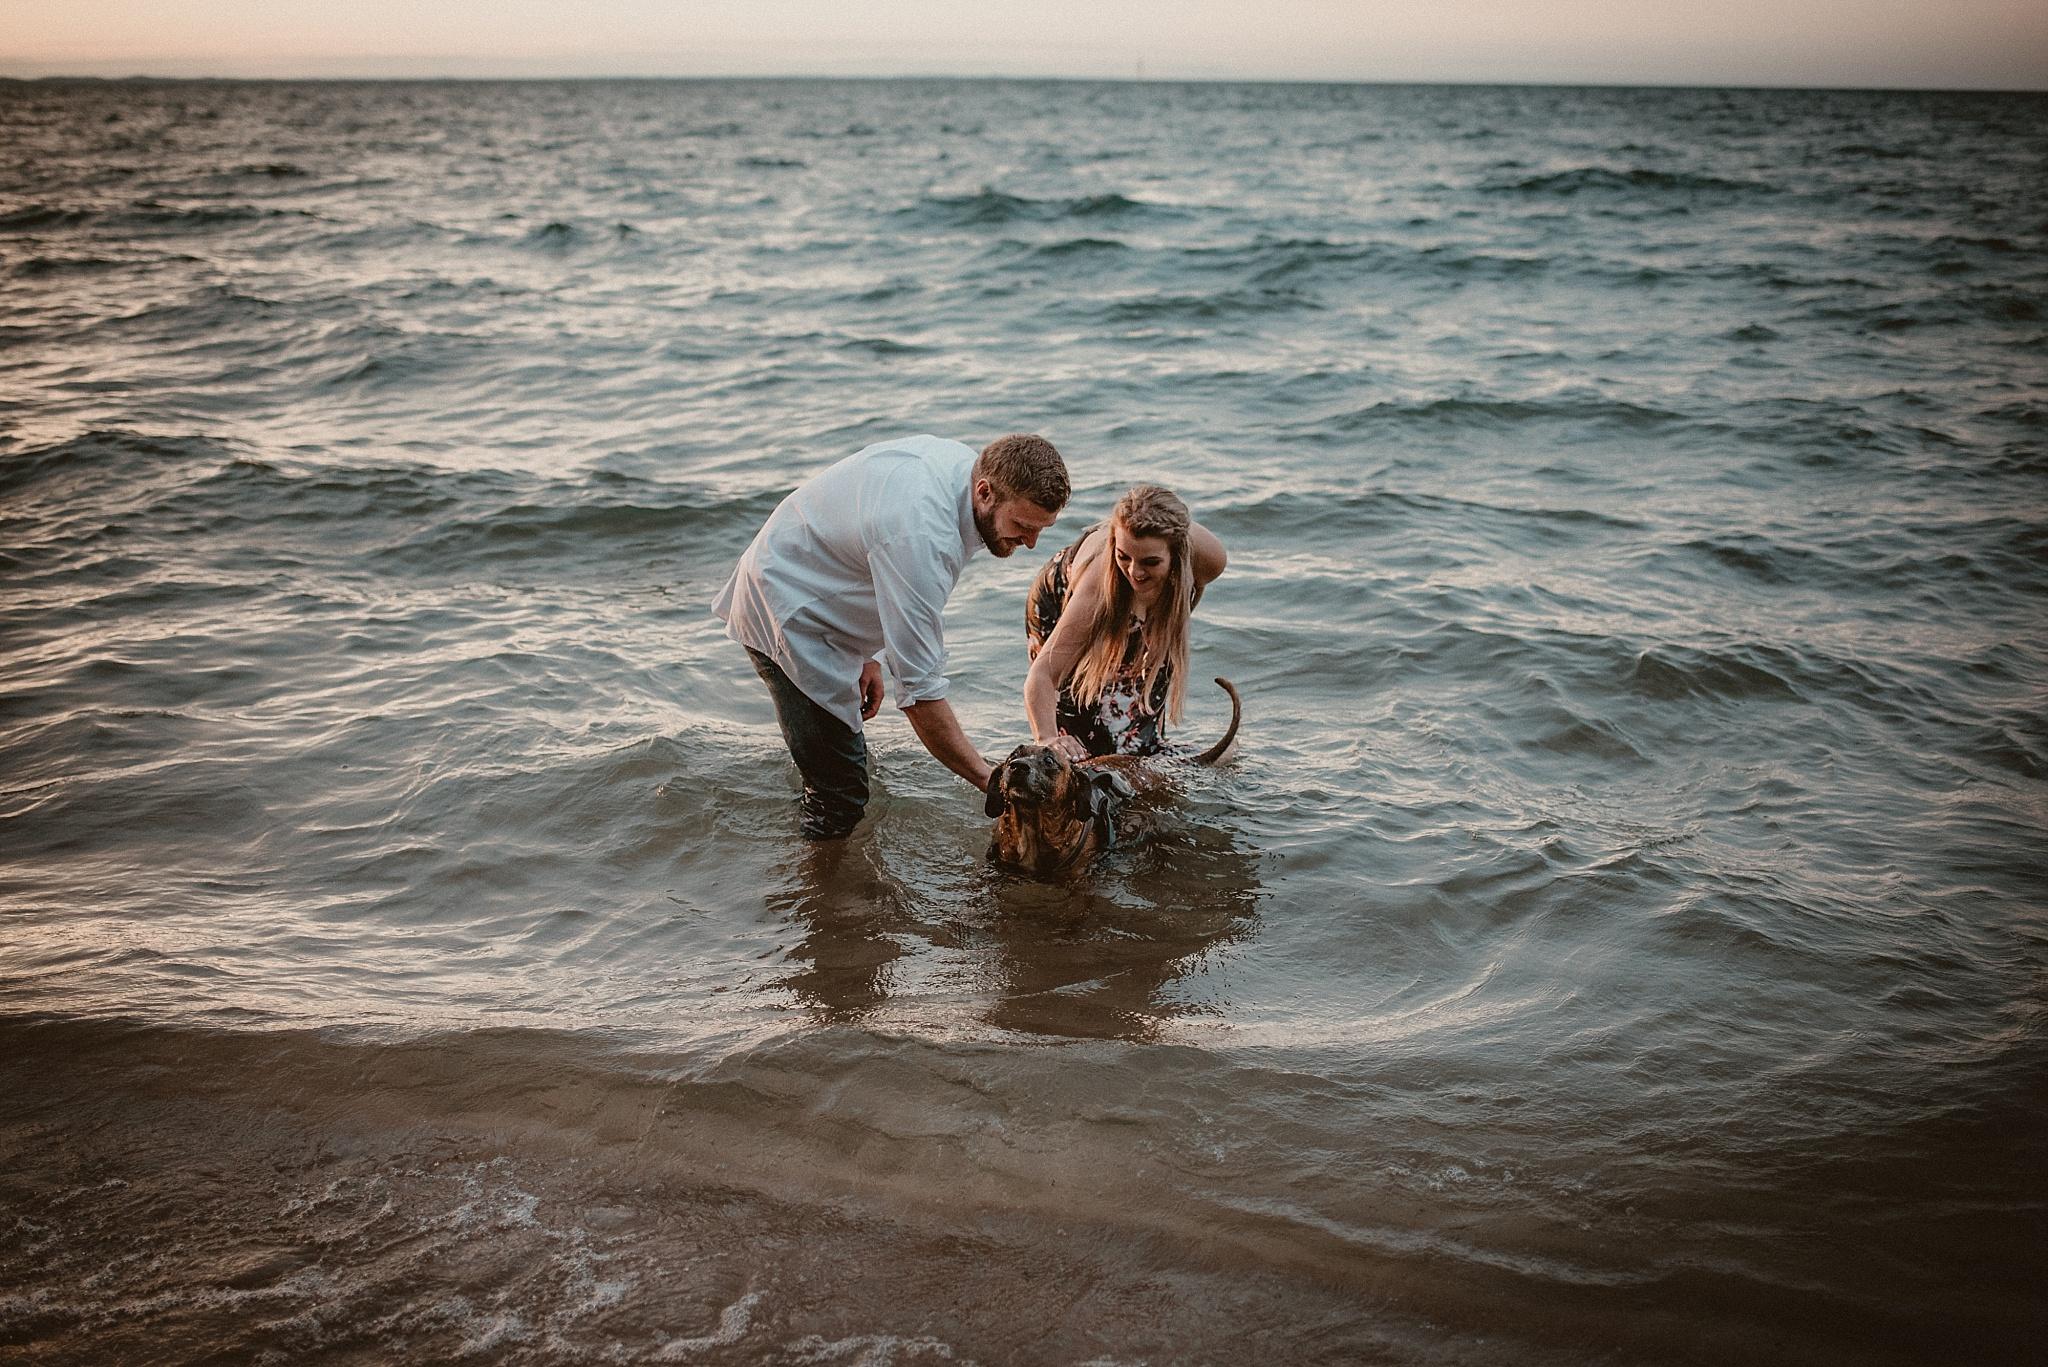 Northern-Michigan-Photographer,Sunset-Engagement-Photo-Shoot-Old-Mission-Peninsula-Lighthouse-Traverse-City-Michigan-Northern-MI-Wedding-Photography,